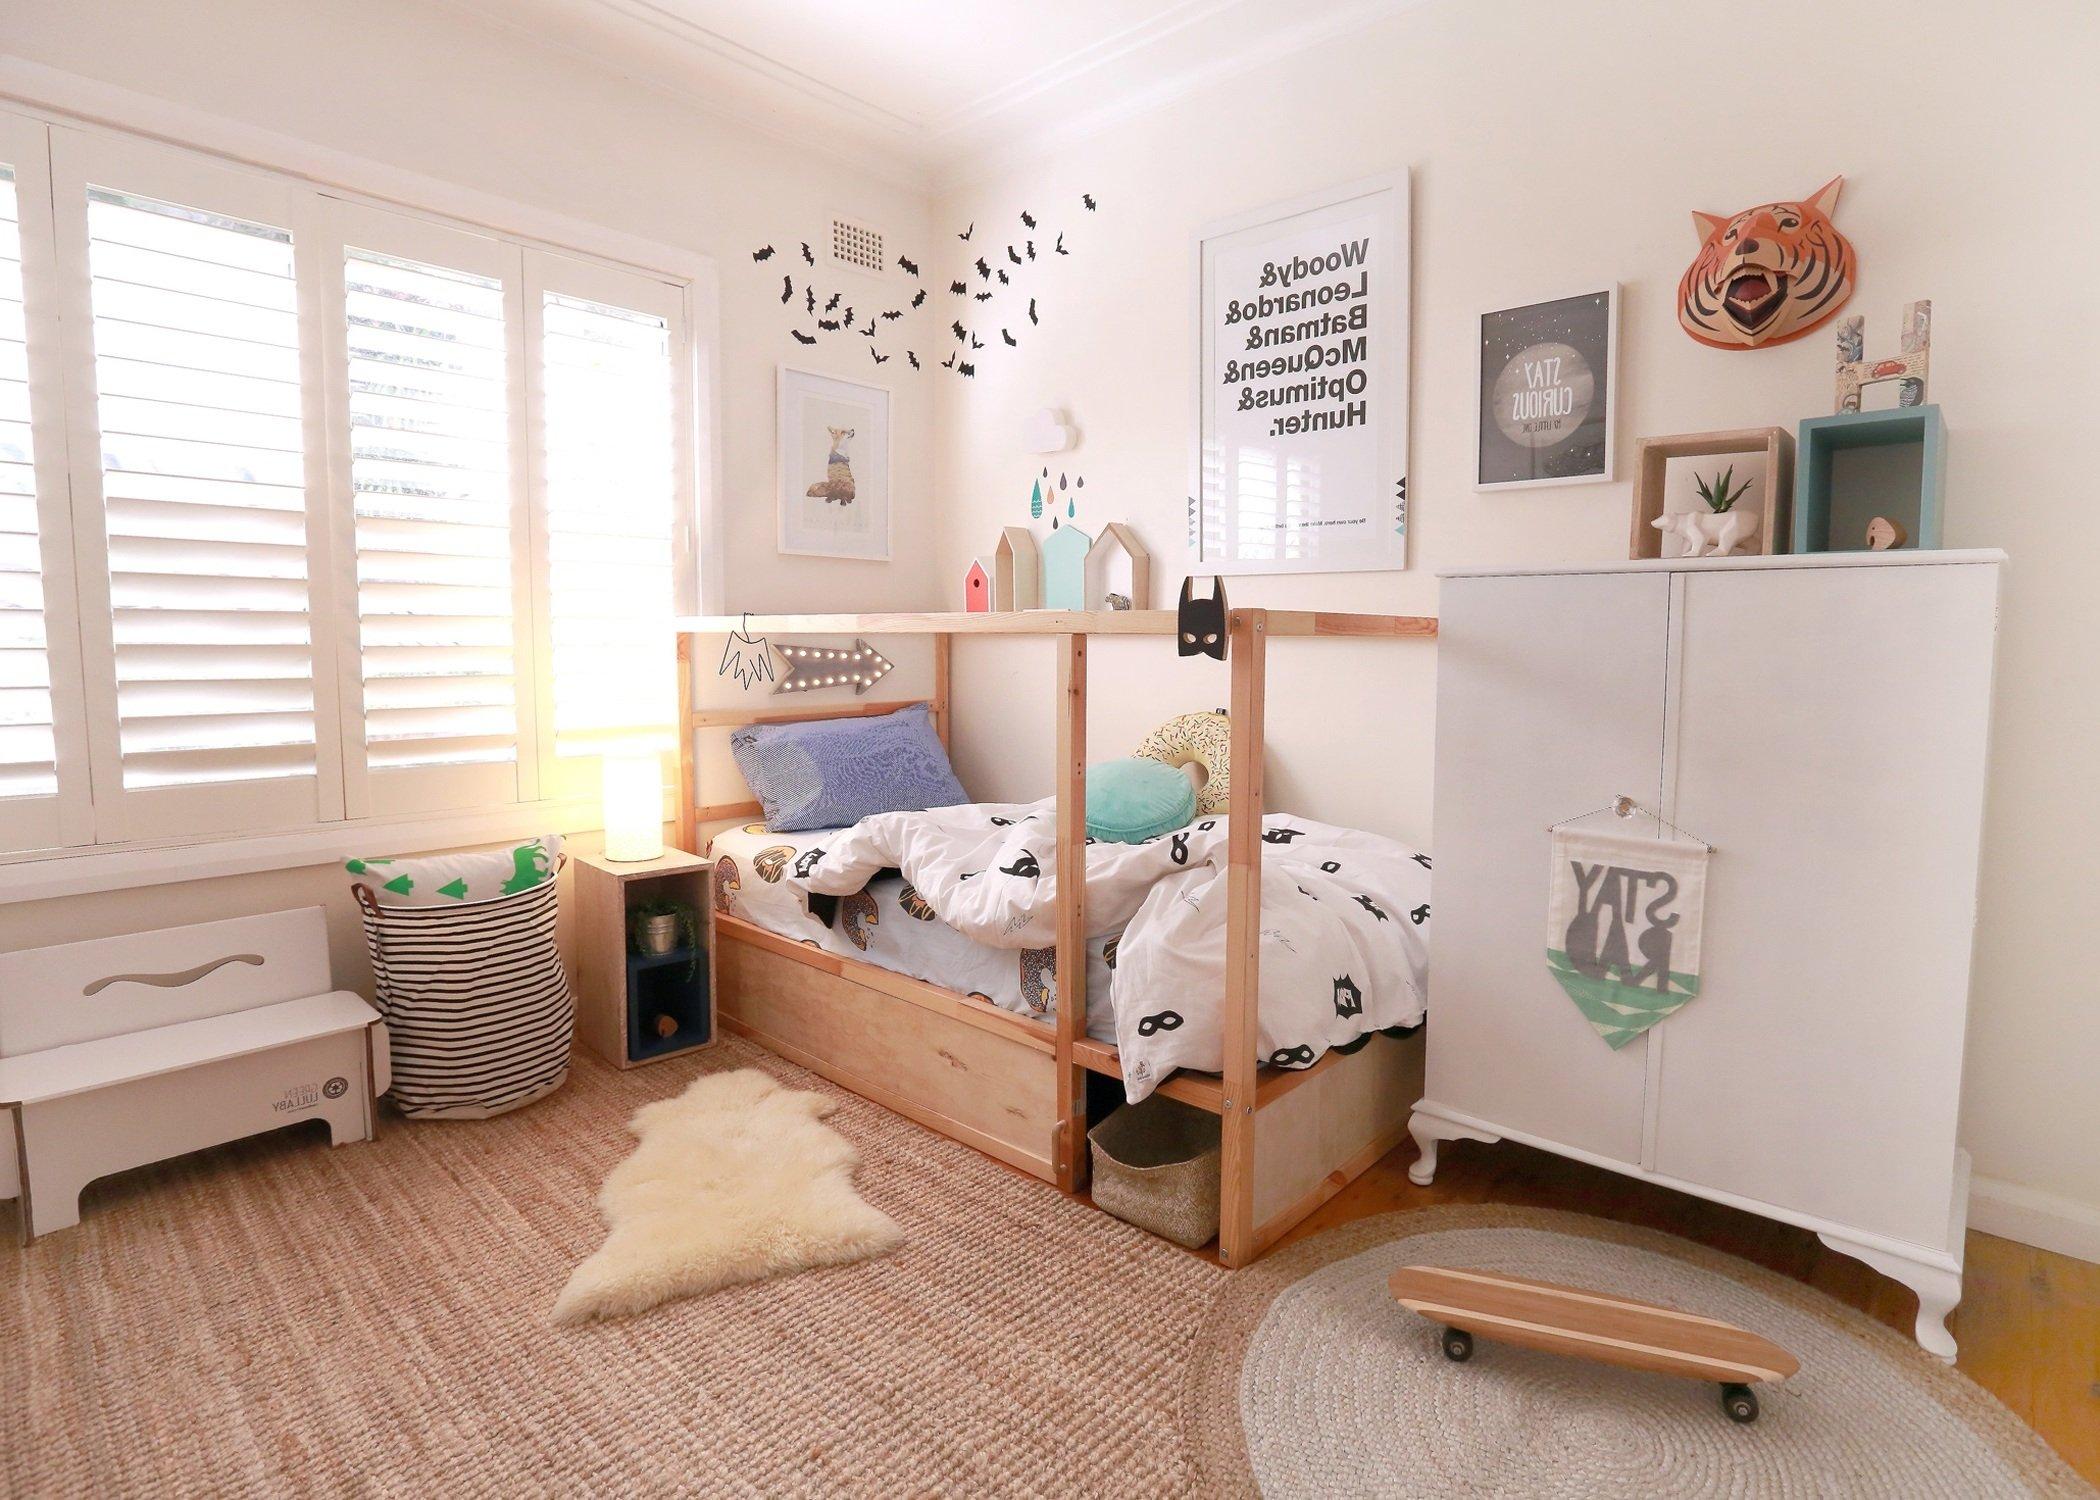 Ikea Kinderzimmer einrichten mit Kura Bett